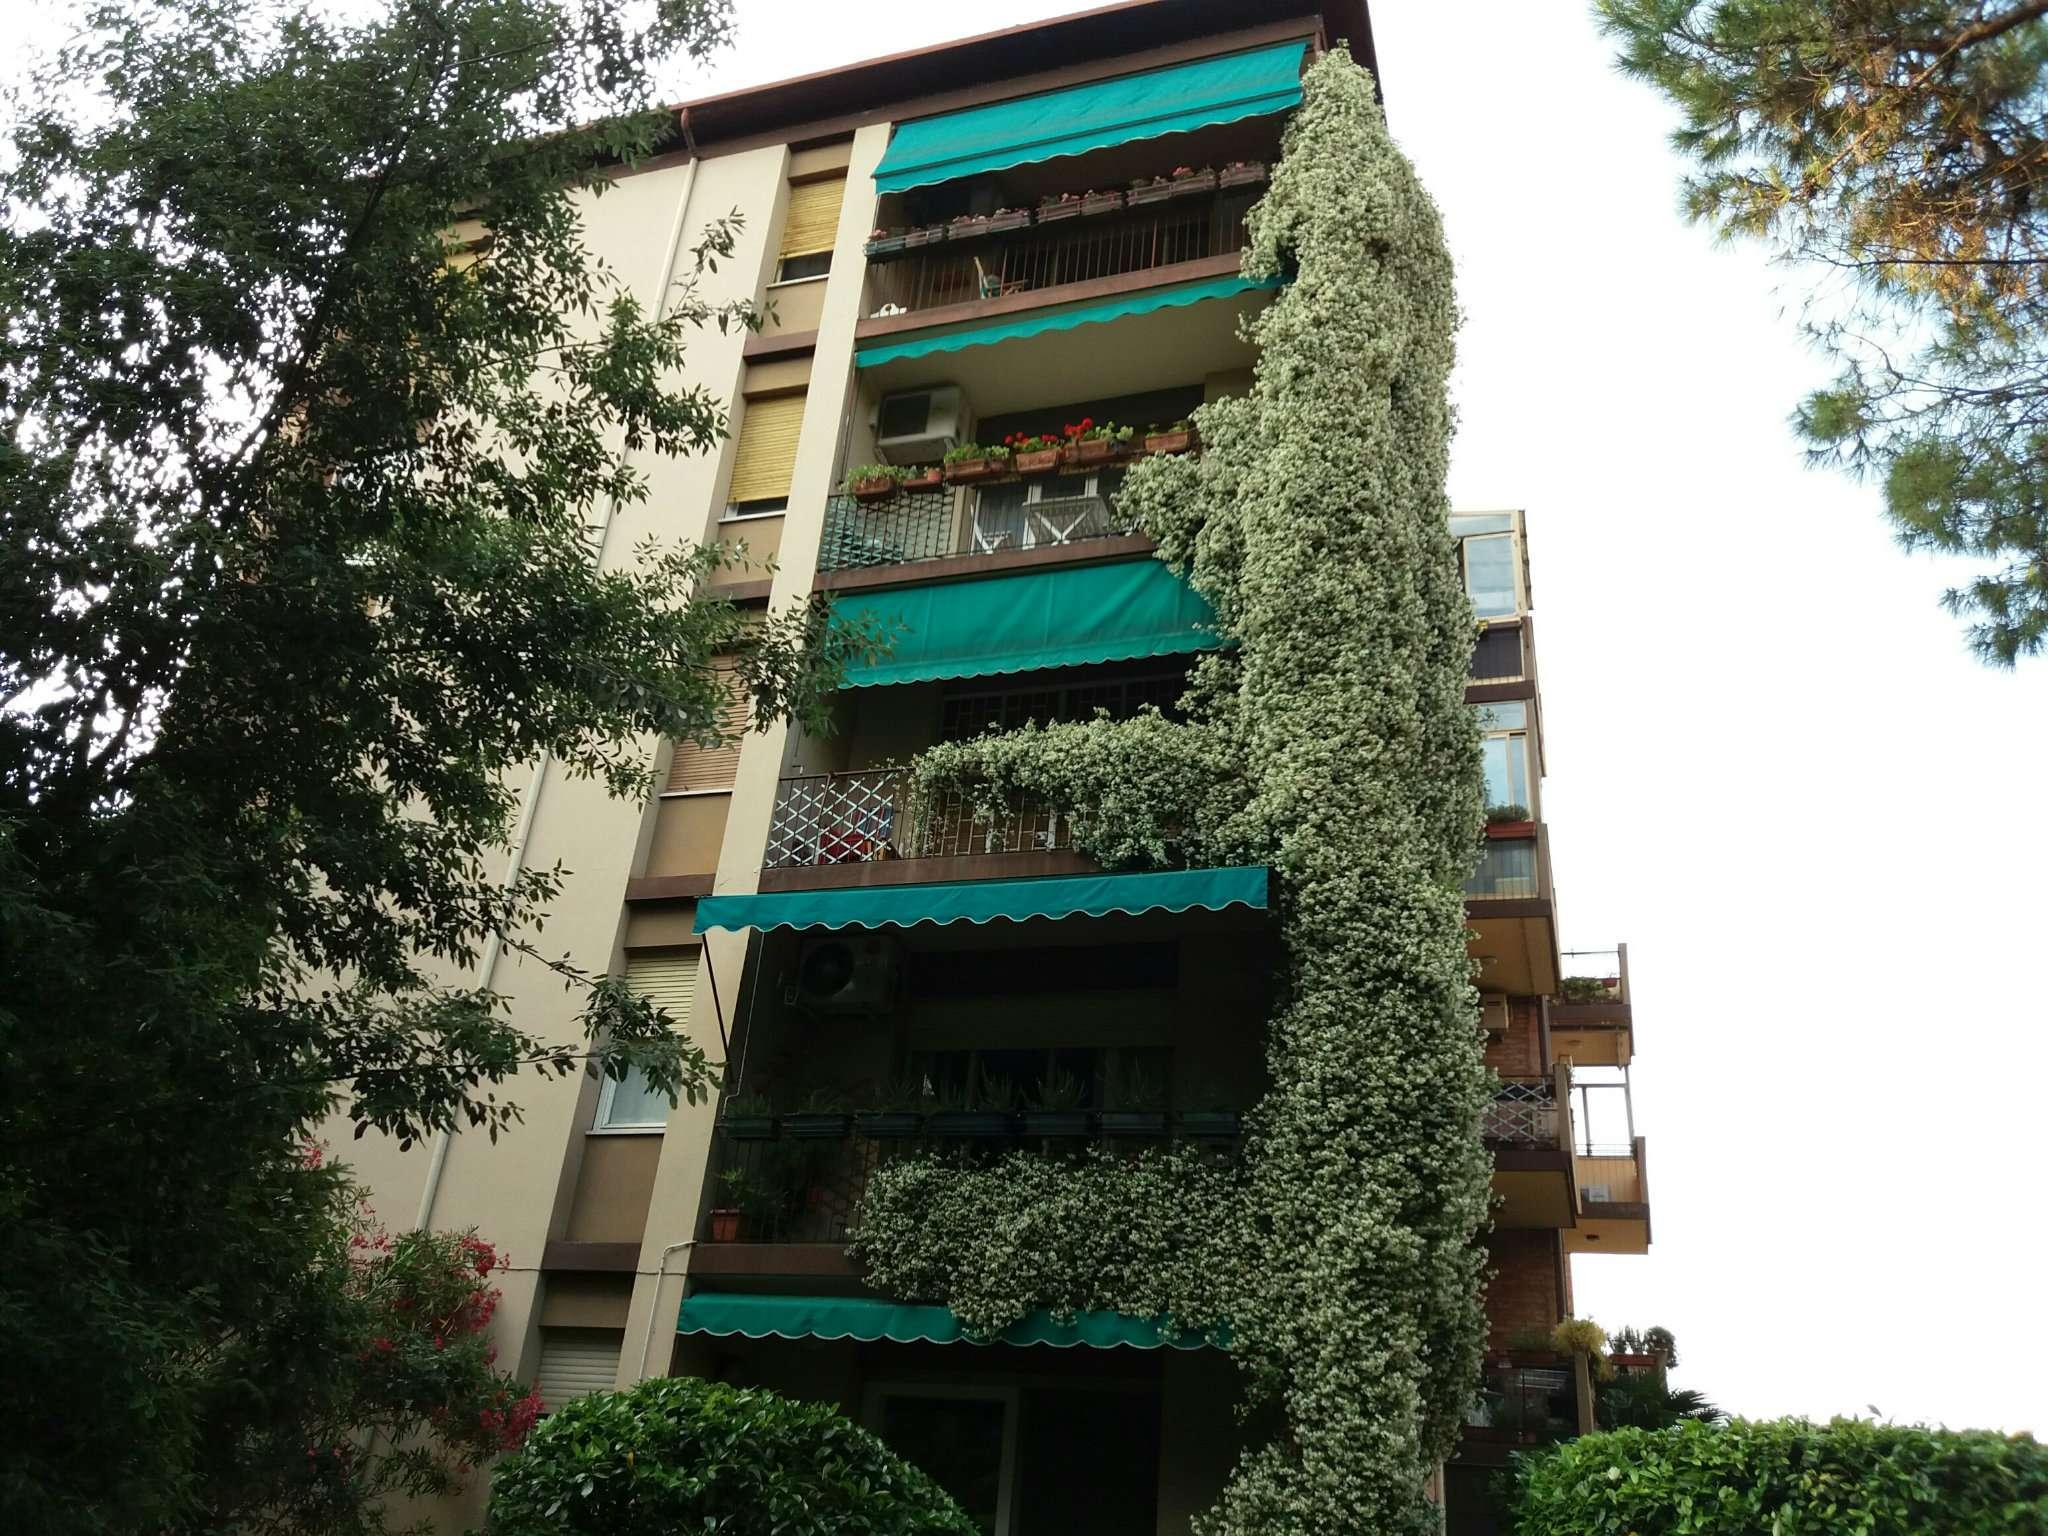 Appartamento PADOVA vendita  SPECOLA  Agenzia Immobiliare SAN LEONARDO